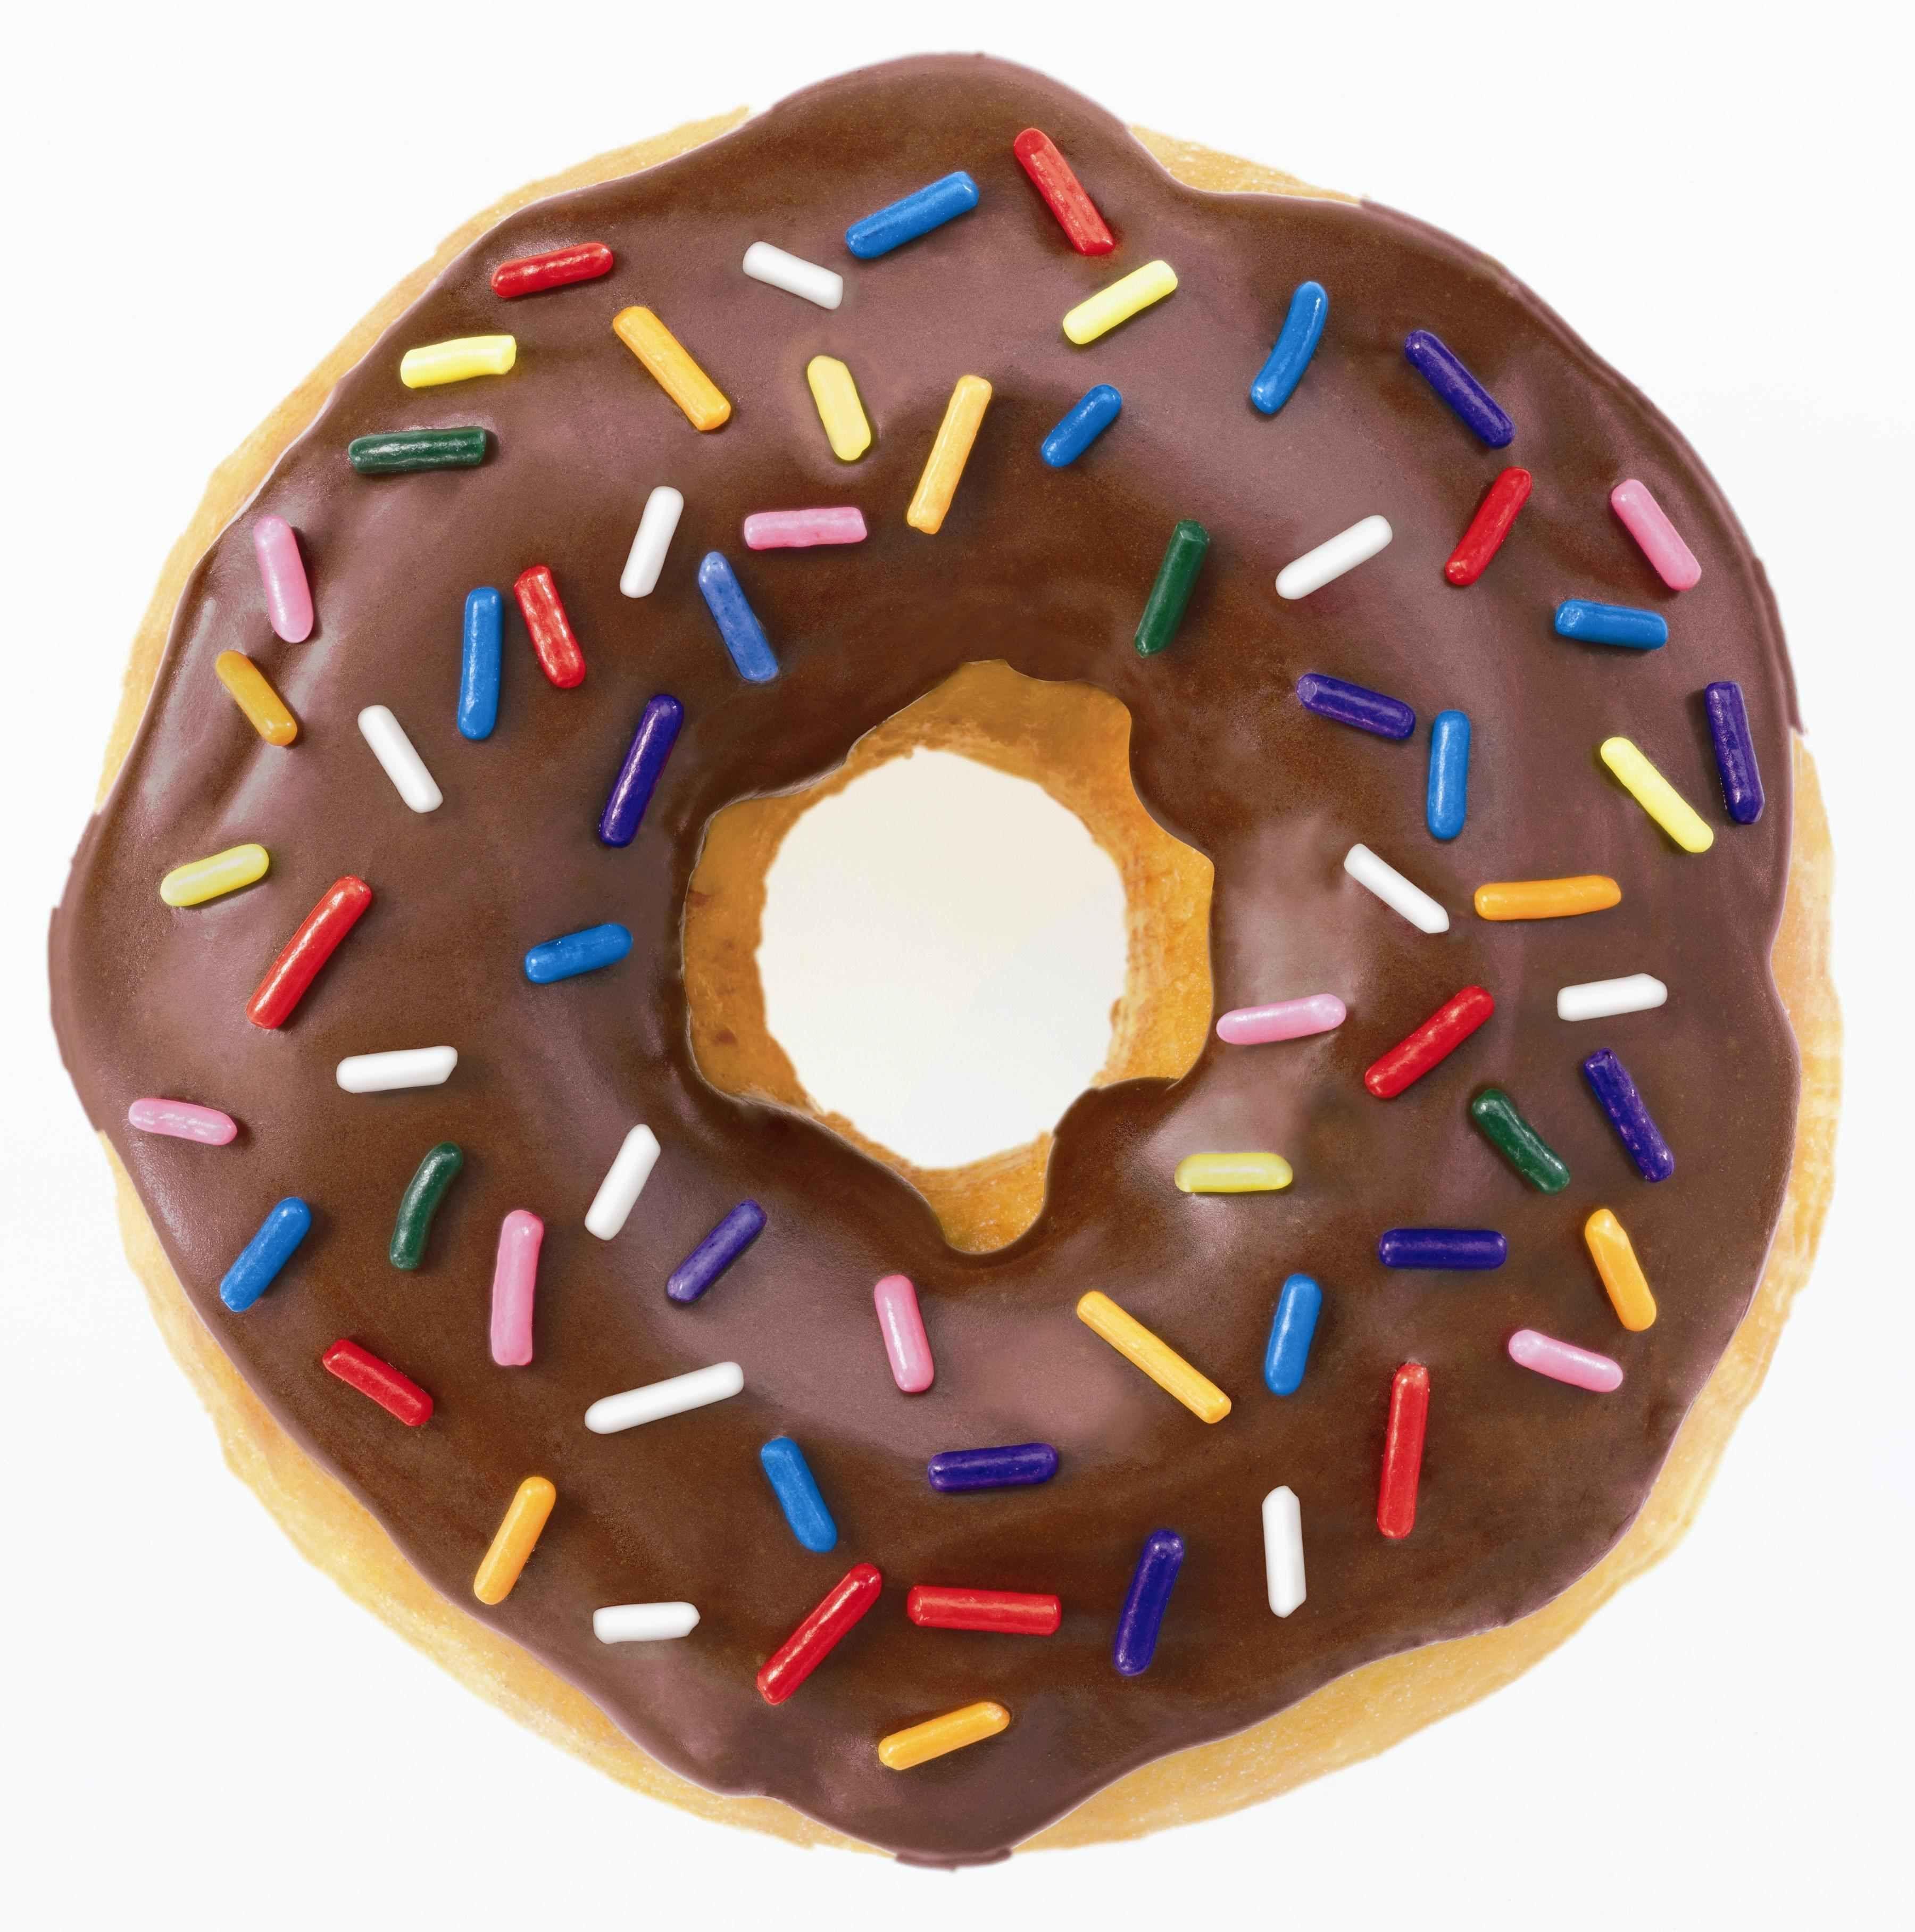 Box of choco image. Donuts clipart sugar donut